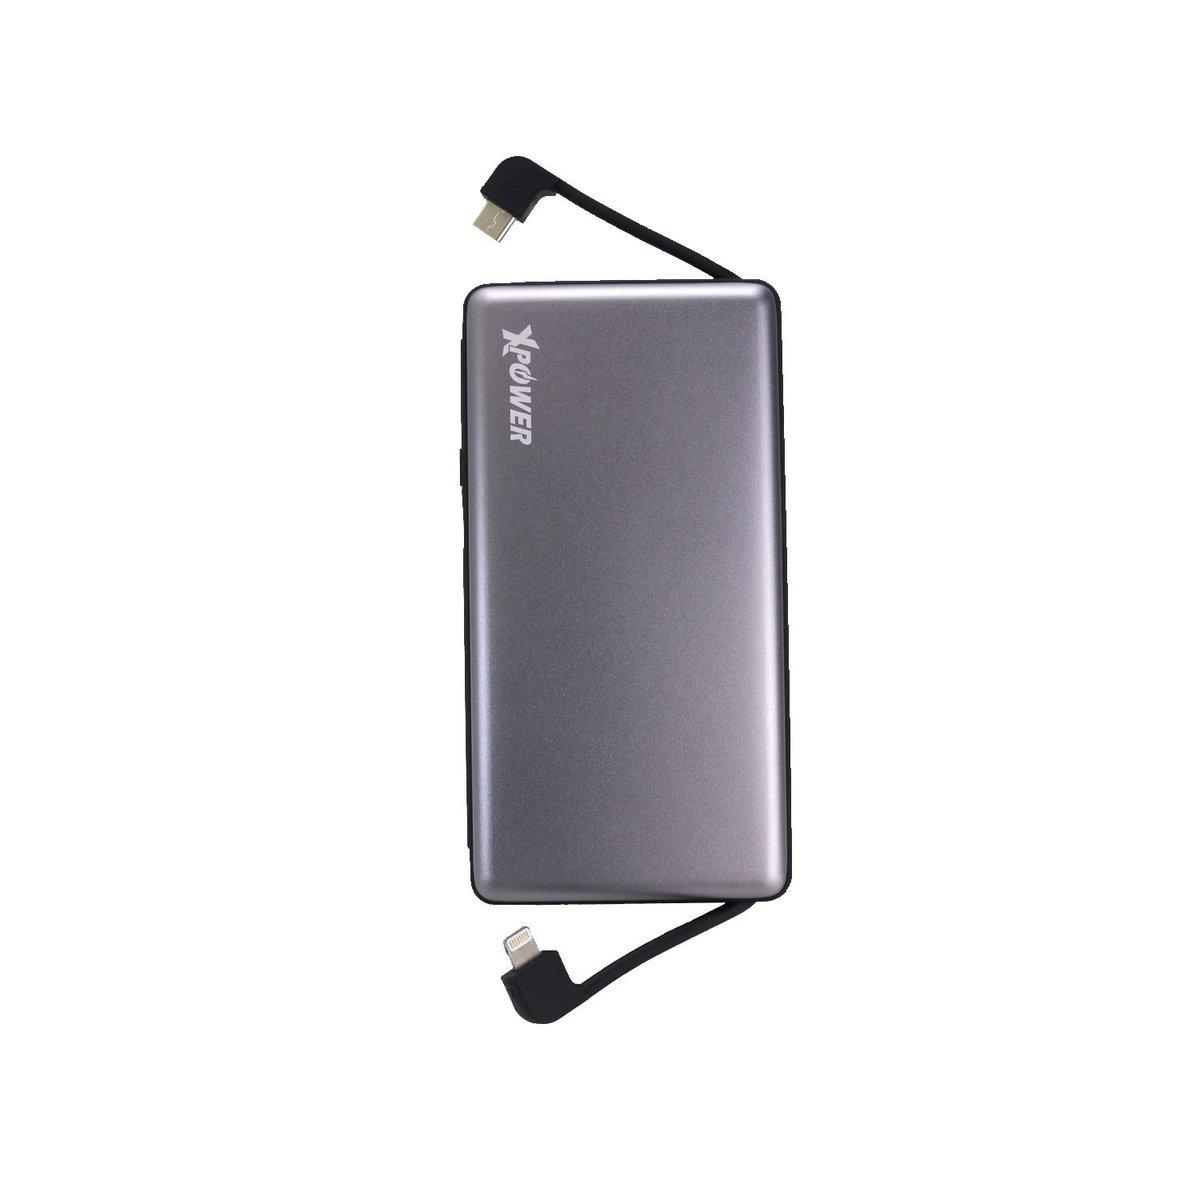 WP104 Wireless/PD/QC 30W 10000mAh Power Bank